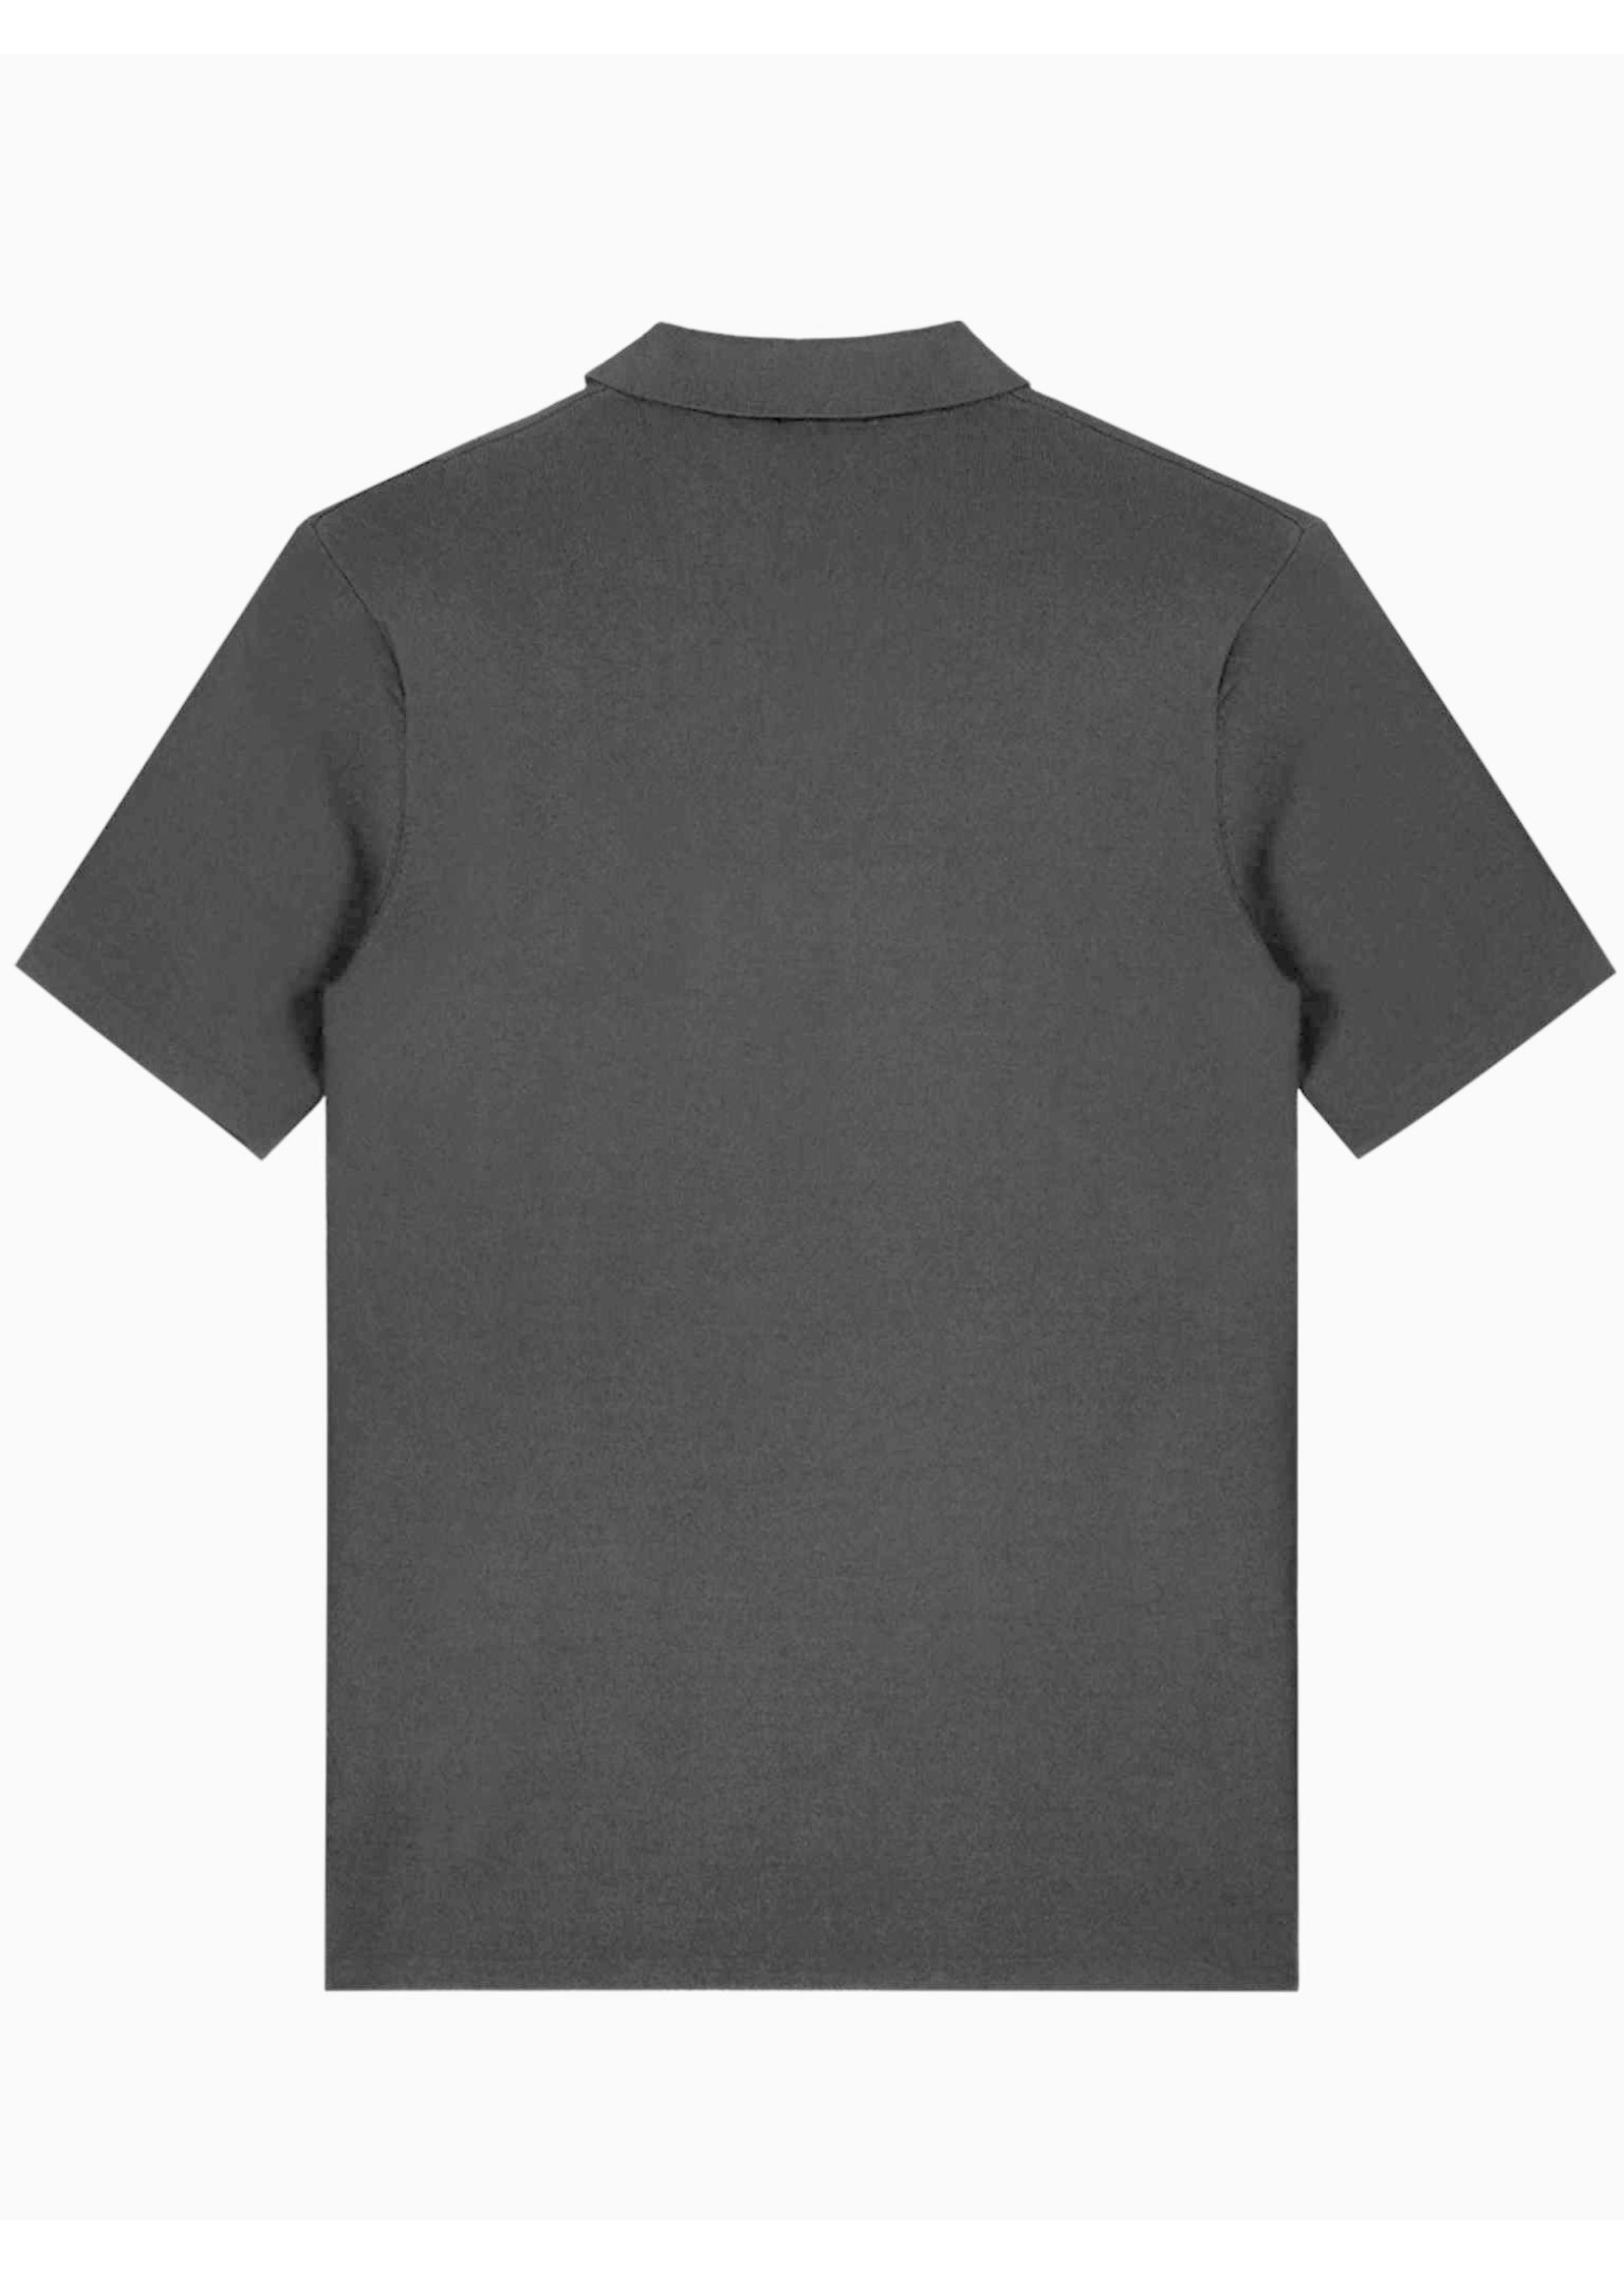 Sustain Sustain Knit Polo - Black